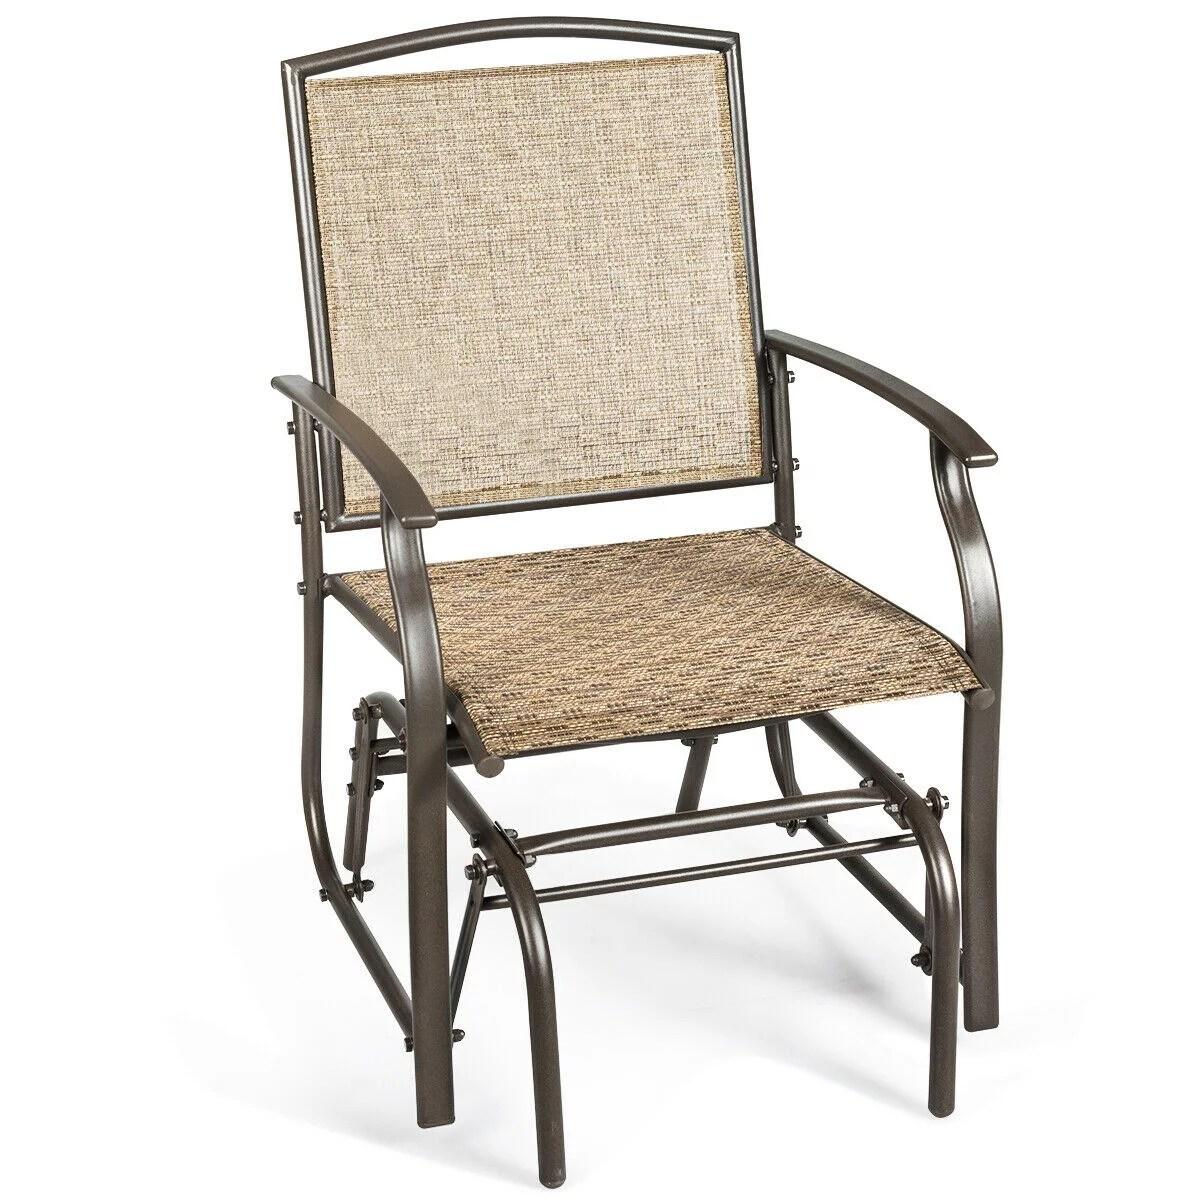 costway patio swing single glider chair rocking seating steel frame garden furni brown walmart com